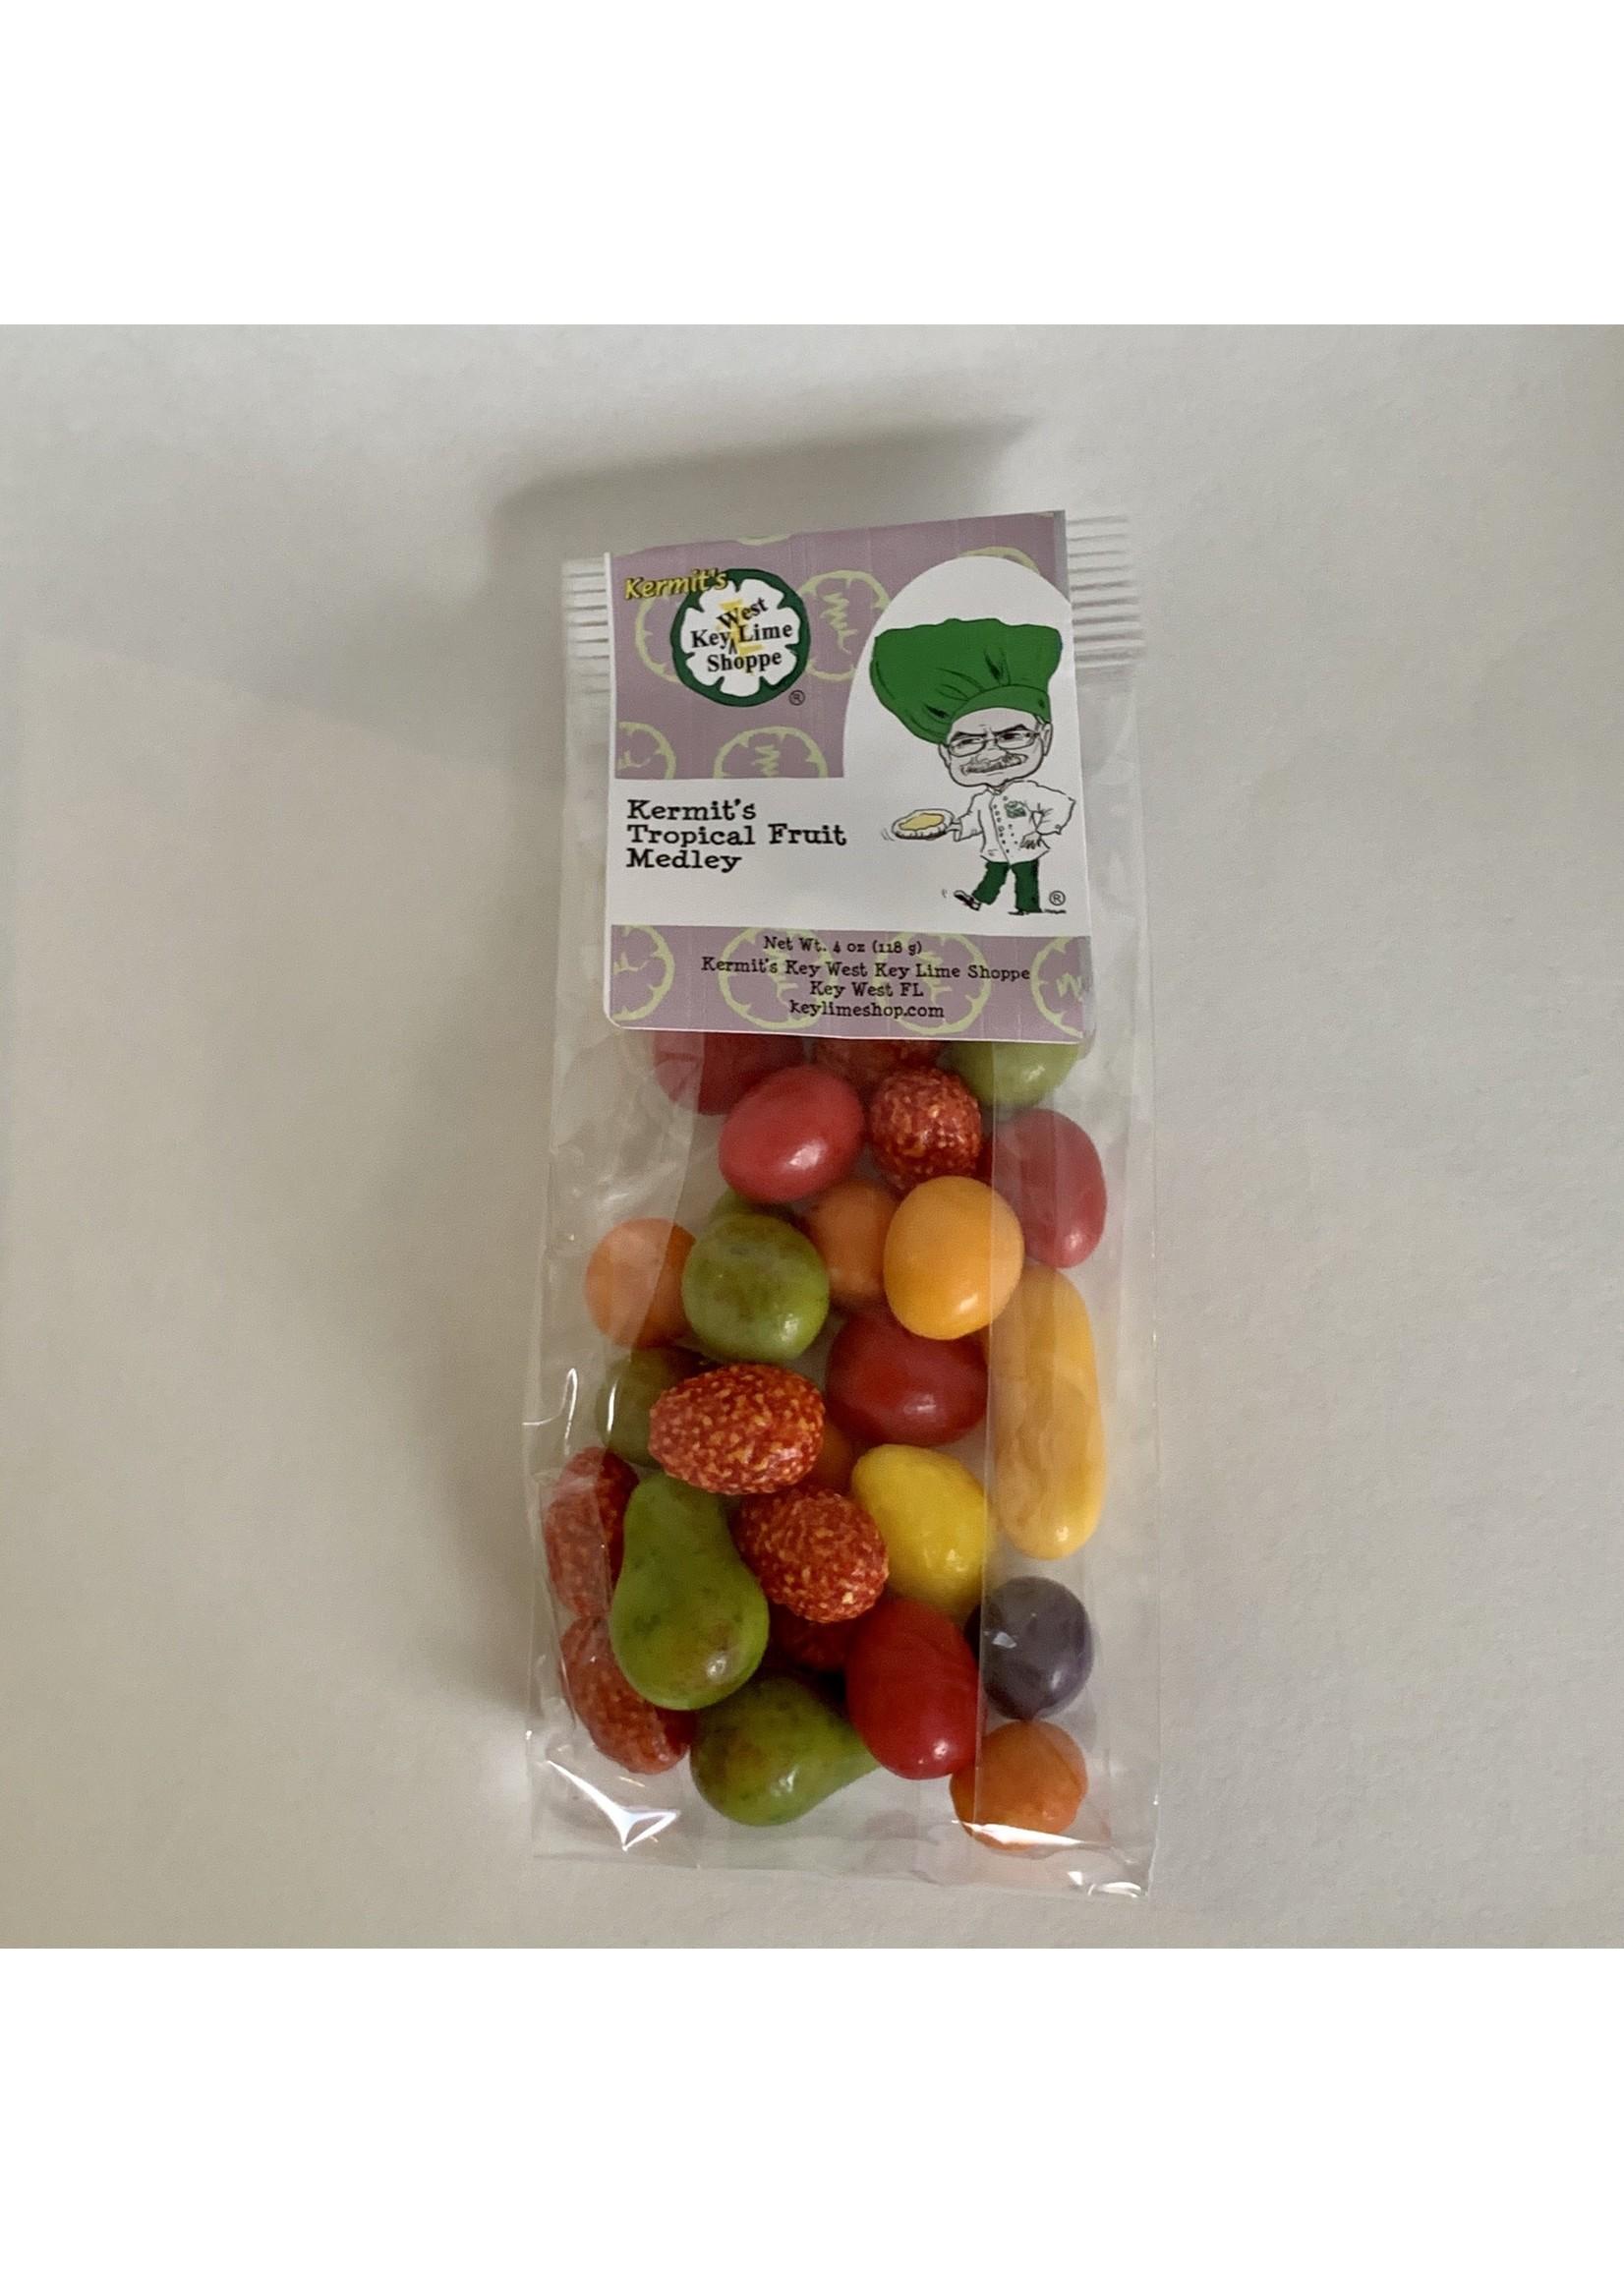 Kermit's Tropical Fruit Medley 4 oz